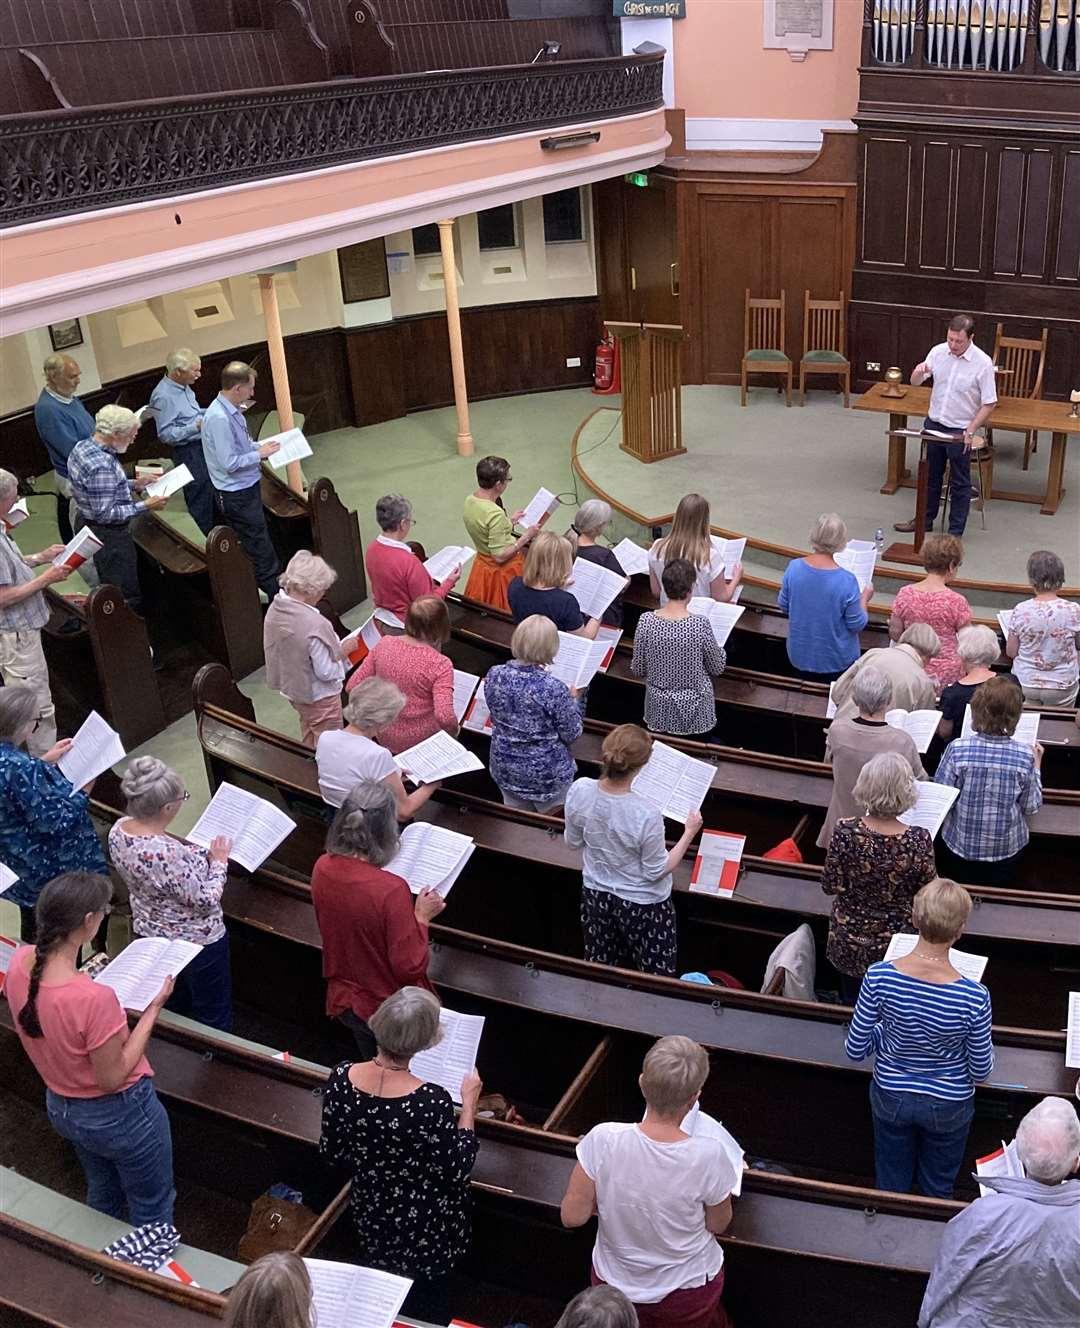 Bishop's Stortford Choral Society resumes rehearsals (51174886)